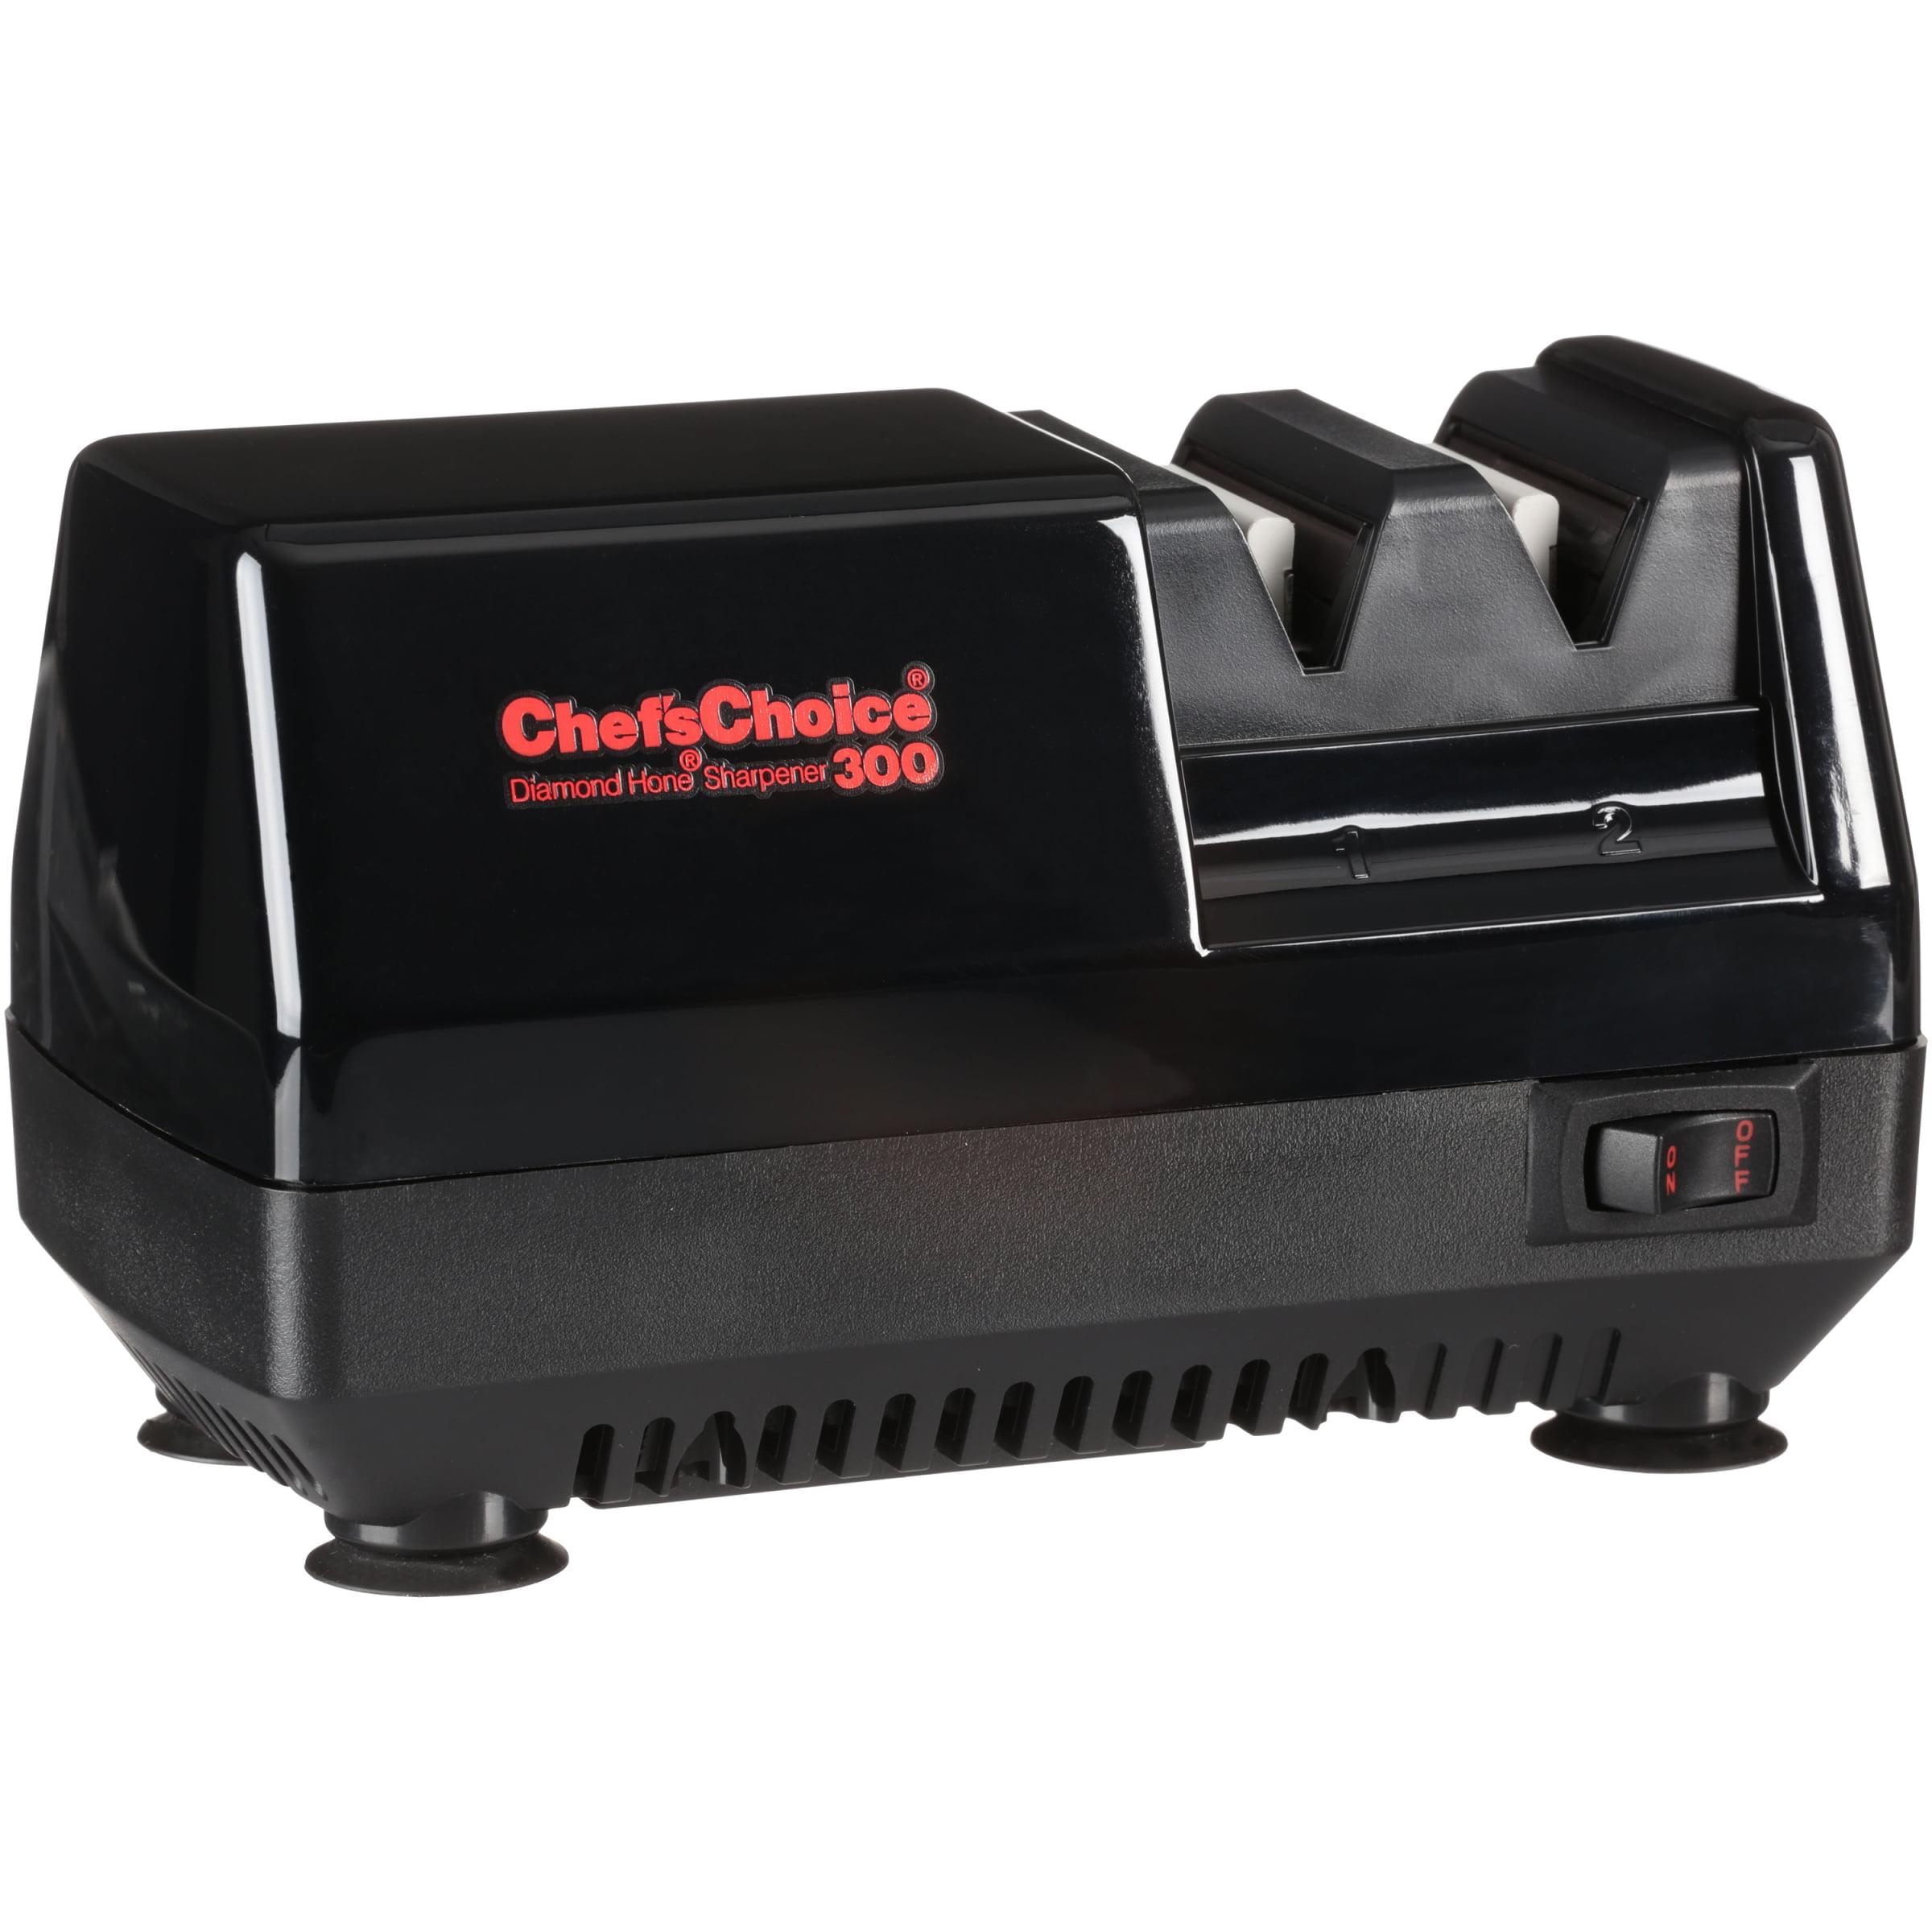 Chef's Choice Black Diamond Hone Knife Sharpener Box by EdgeCraft Corporation,